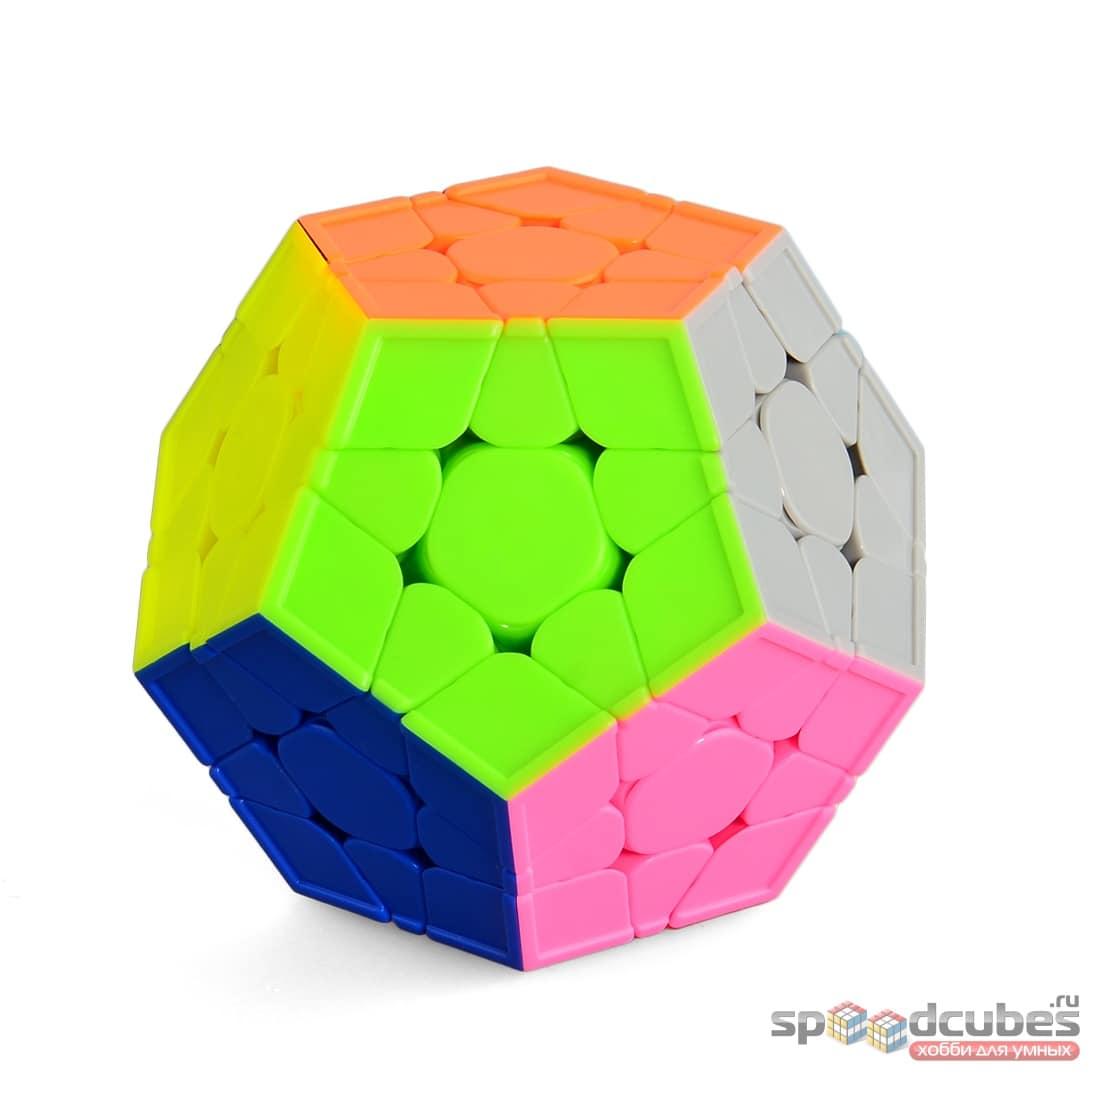 Yuxin Little Magic 3×3 Megaminx 2